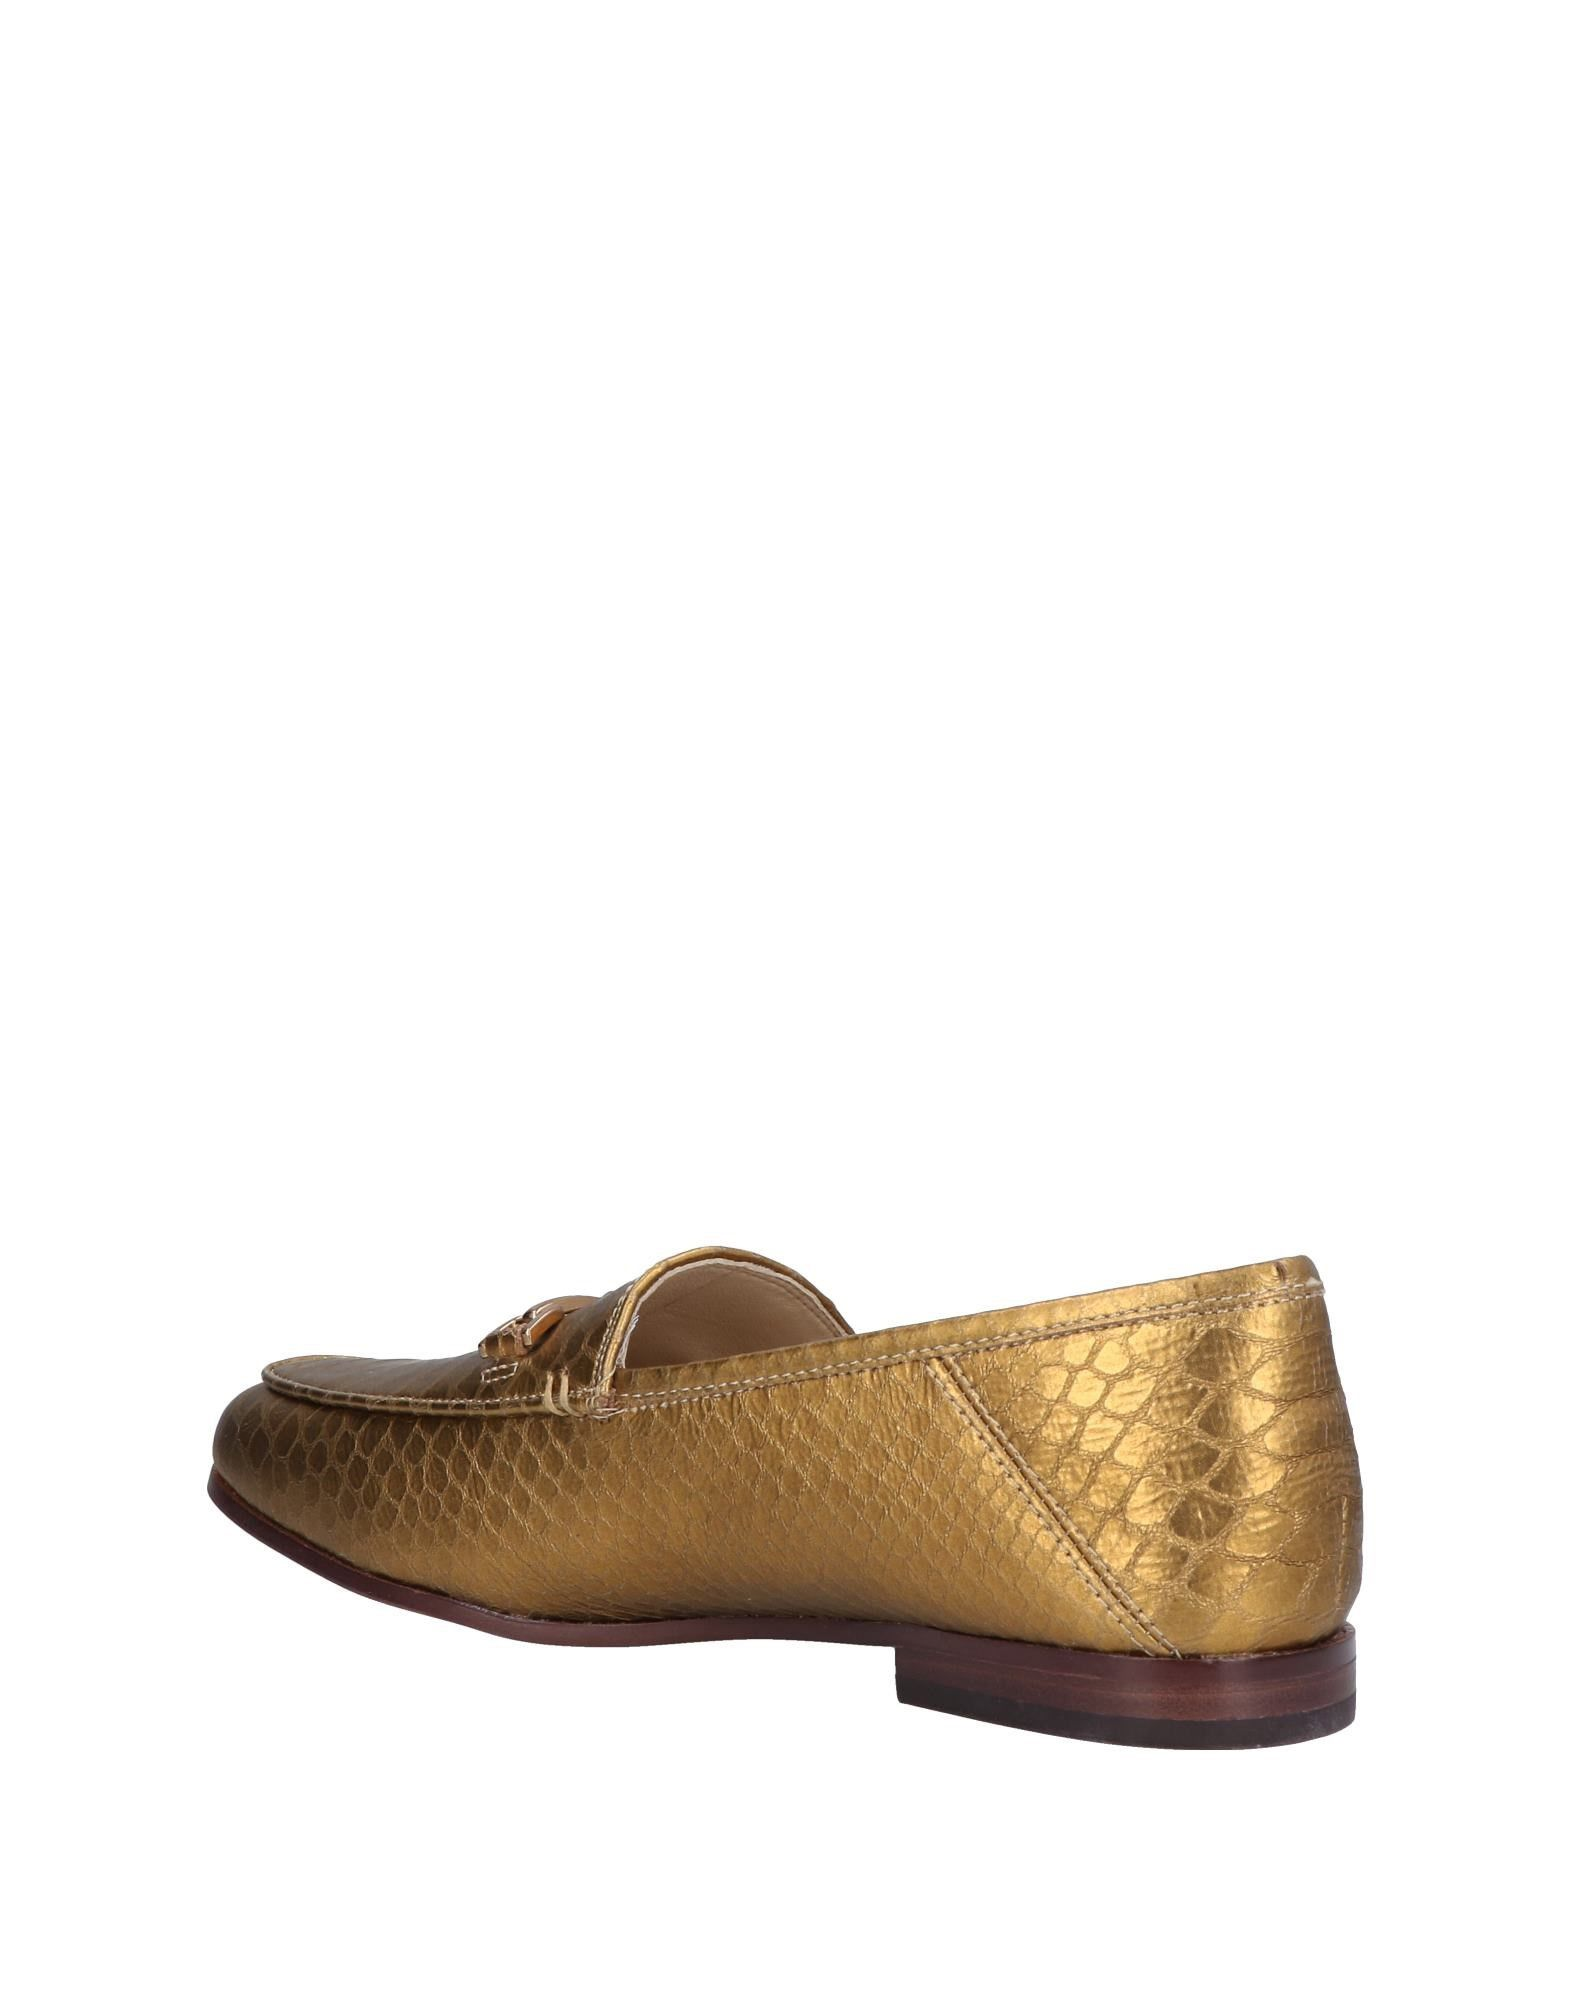 Sam Edelman Mokassins Damen 11466180KF Gute Qualität Qualität Gute beliebte Schuhe 9f3139